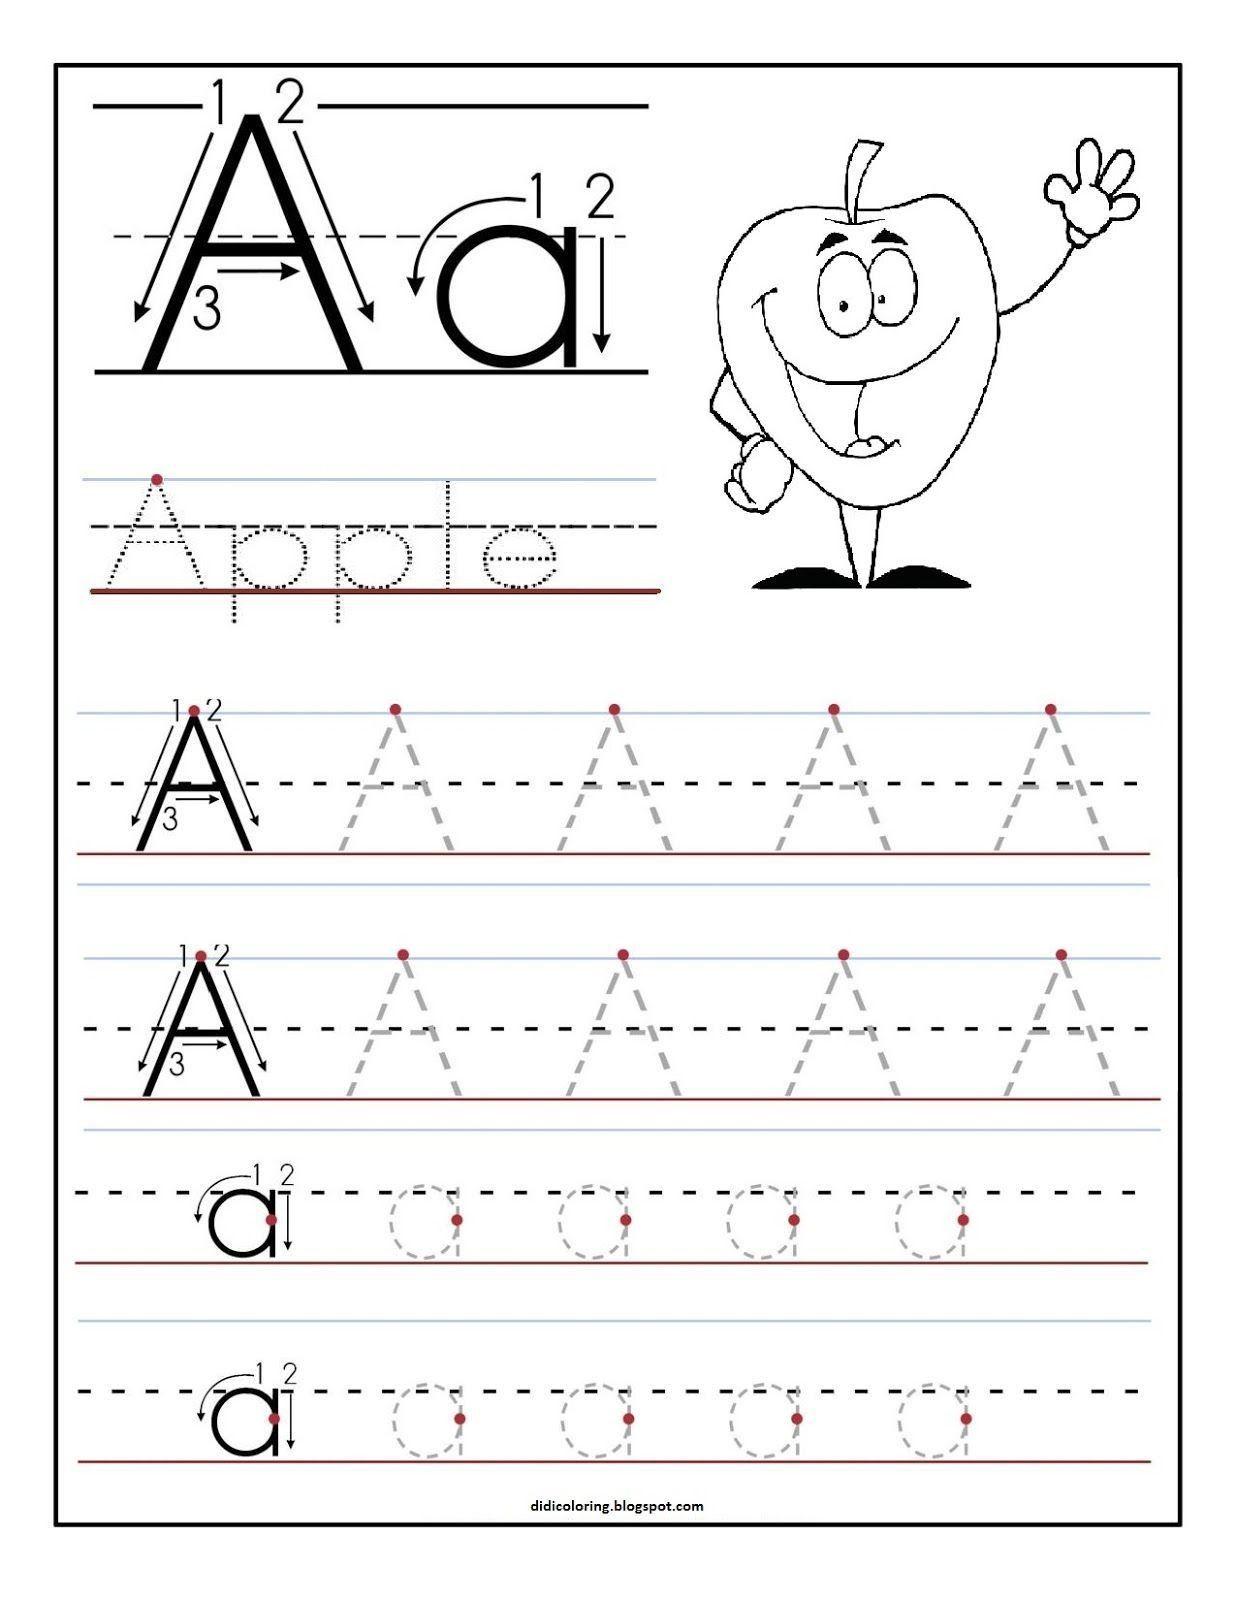 Free Preschool Kindergarten Worksheets Letters Alphabet Printing Letters Letter R Tracing Worksheets Letterherkenning Letter A [ 1600 x 1236 Pixel ]